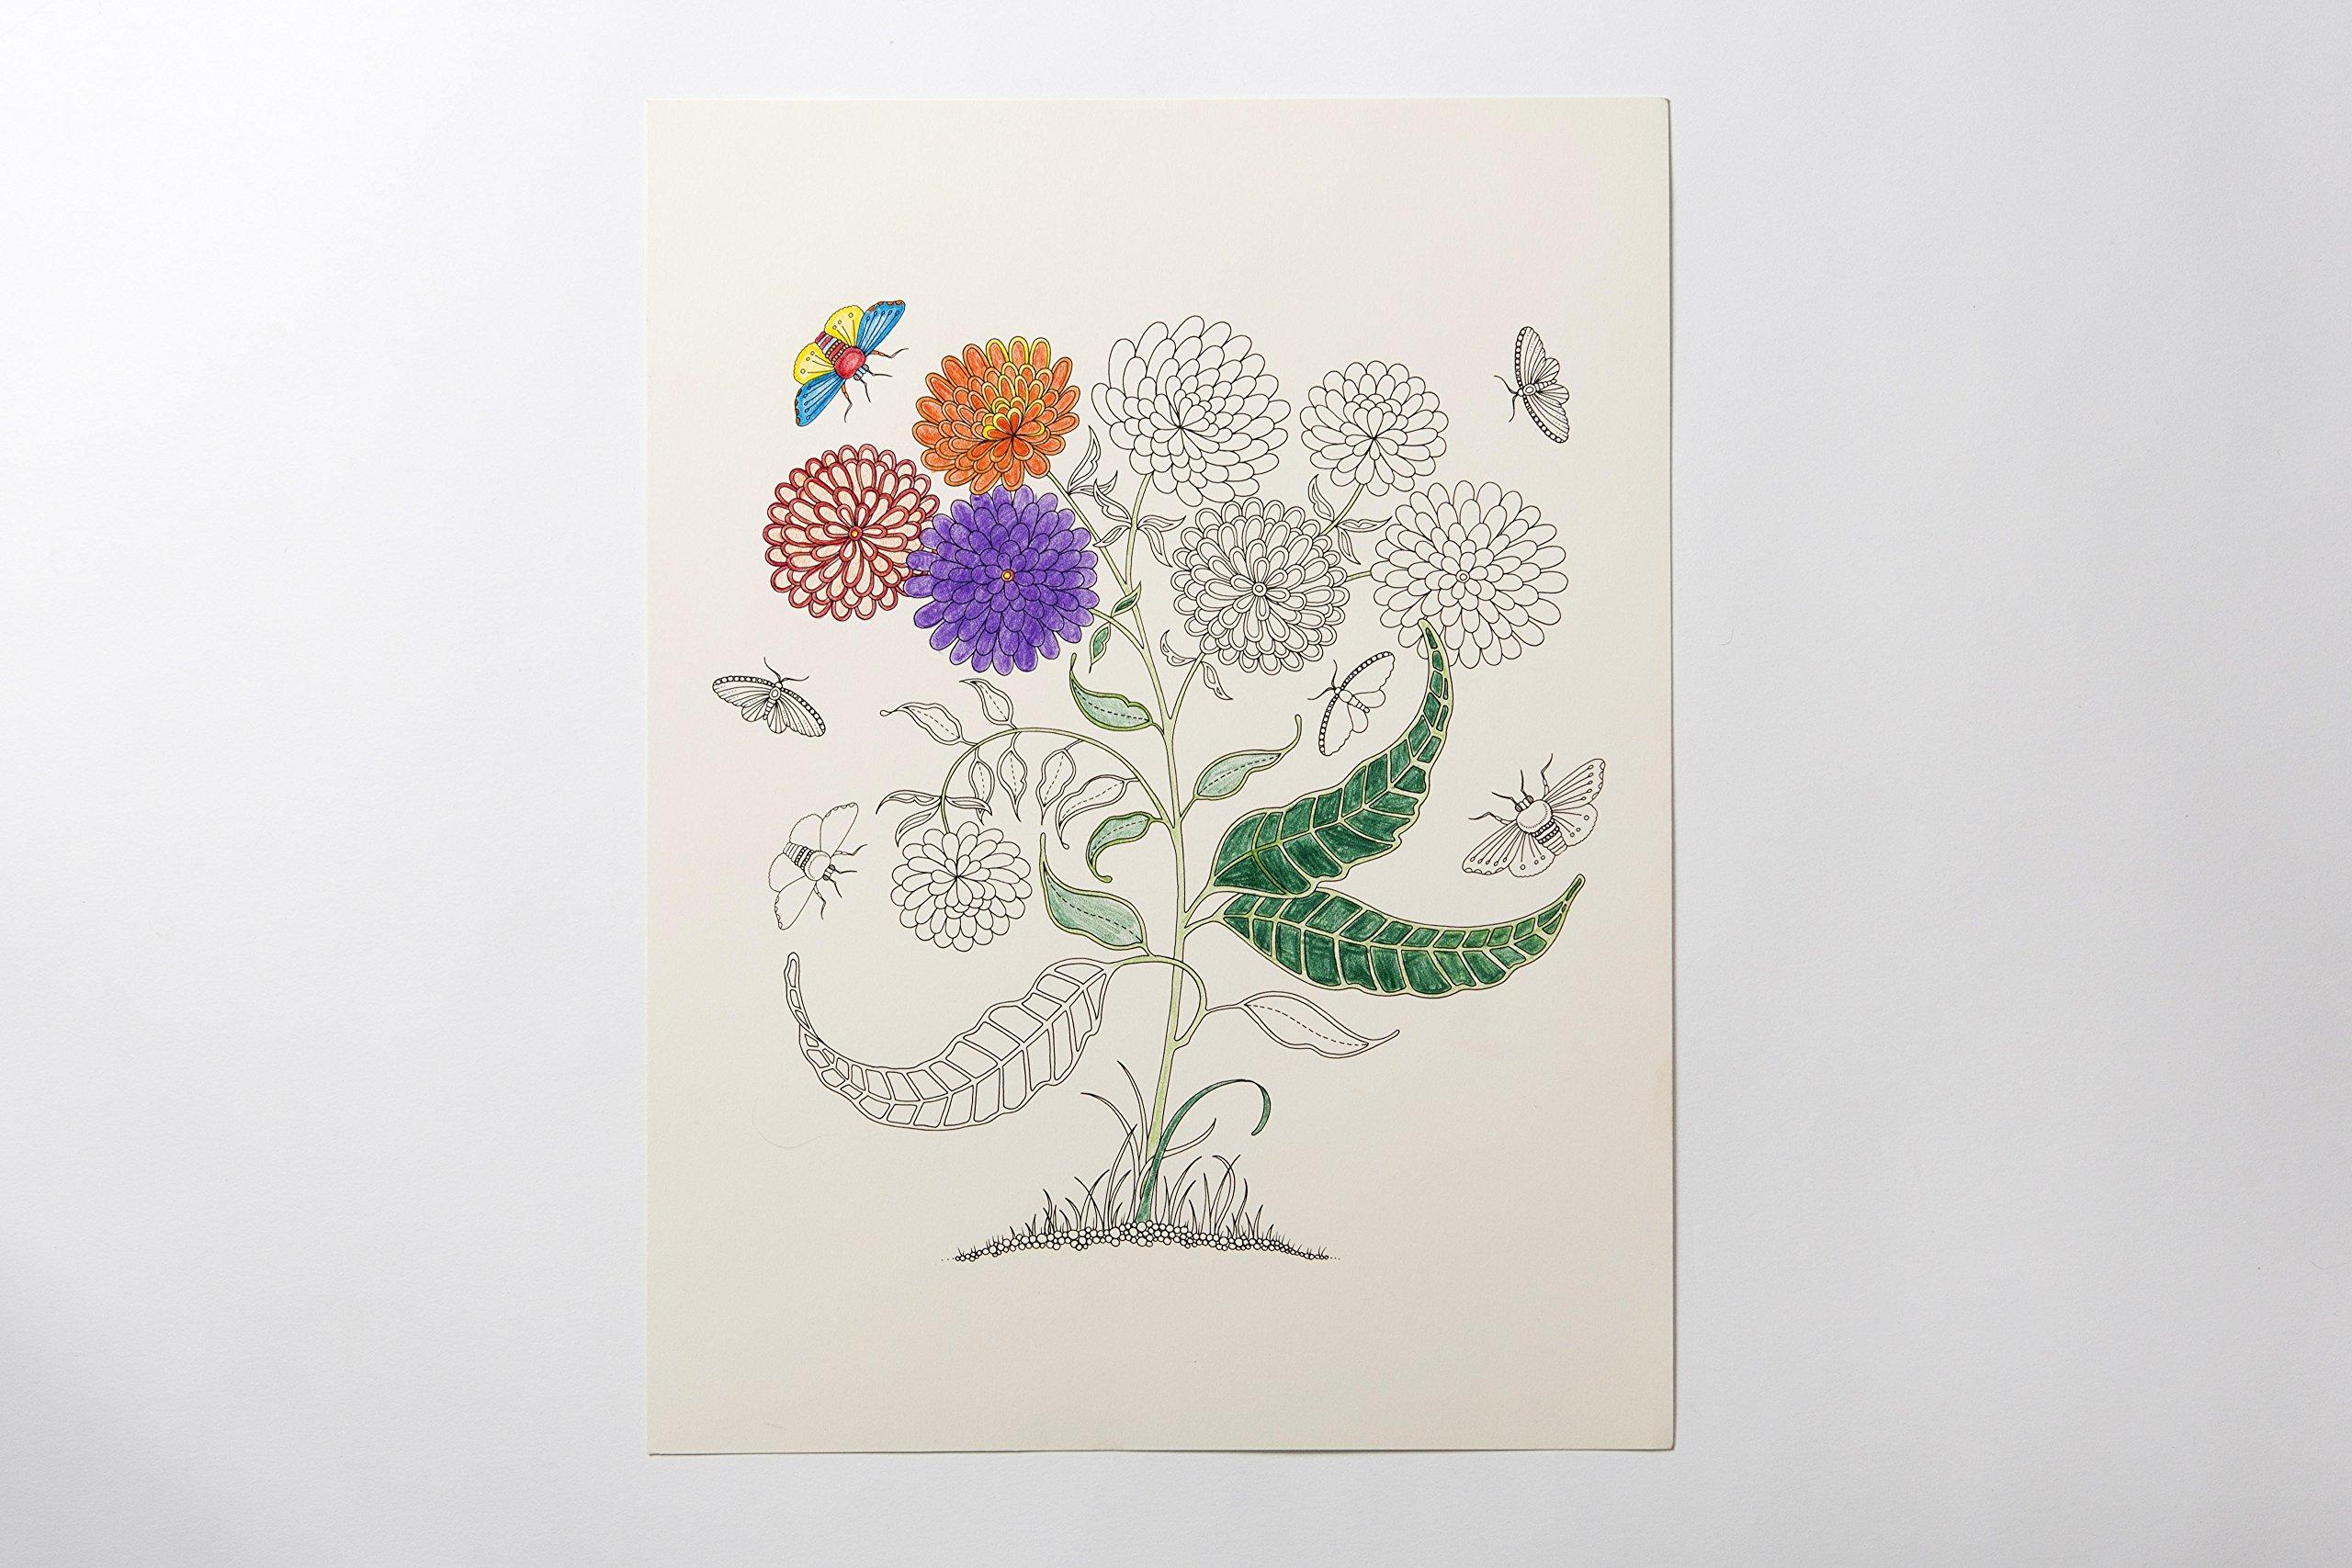 Secret Garden Artist's Edition: A Pull-Out & Frame Colouring Book:  Amazon.co.uk: Johanna Basford: 9781780677309: Books